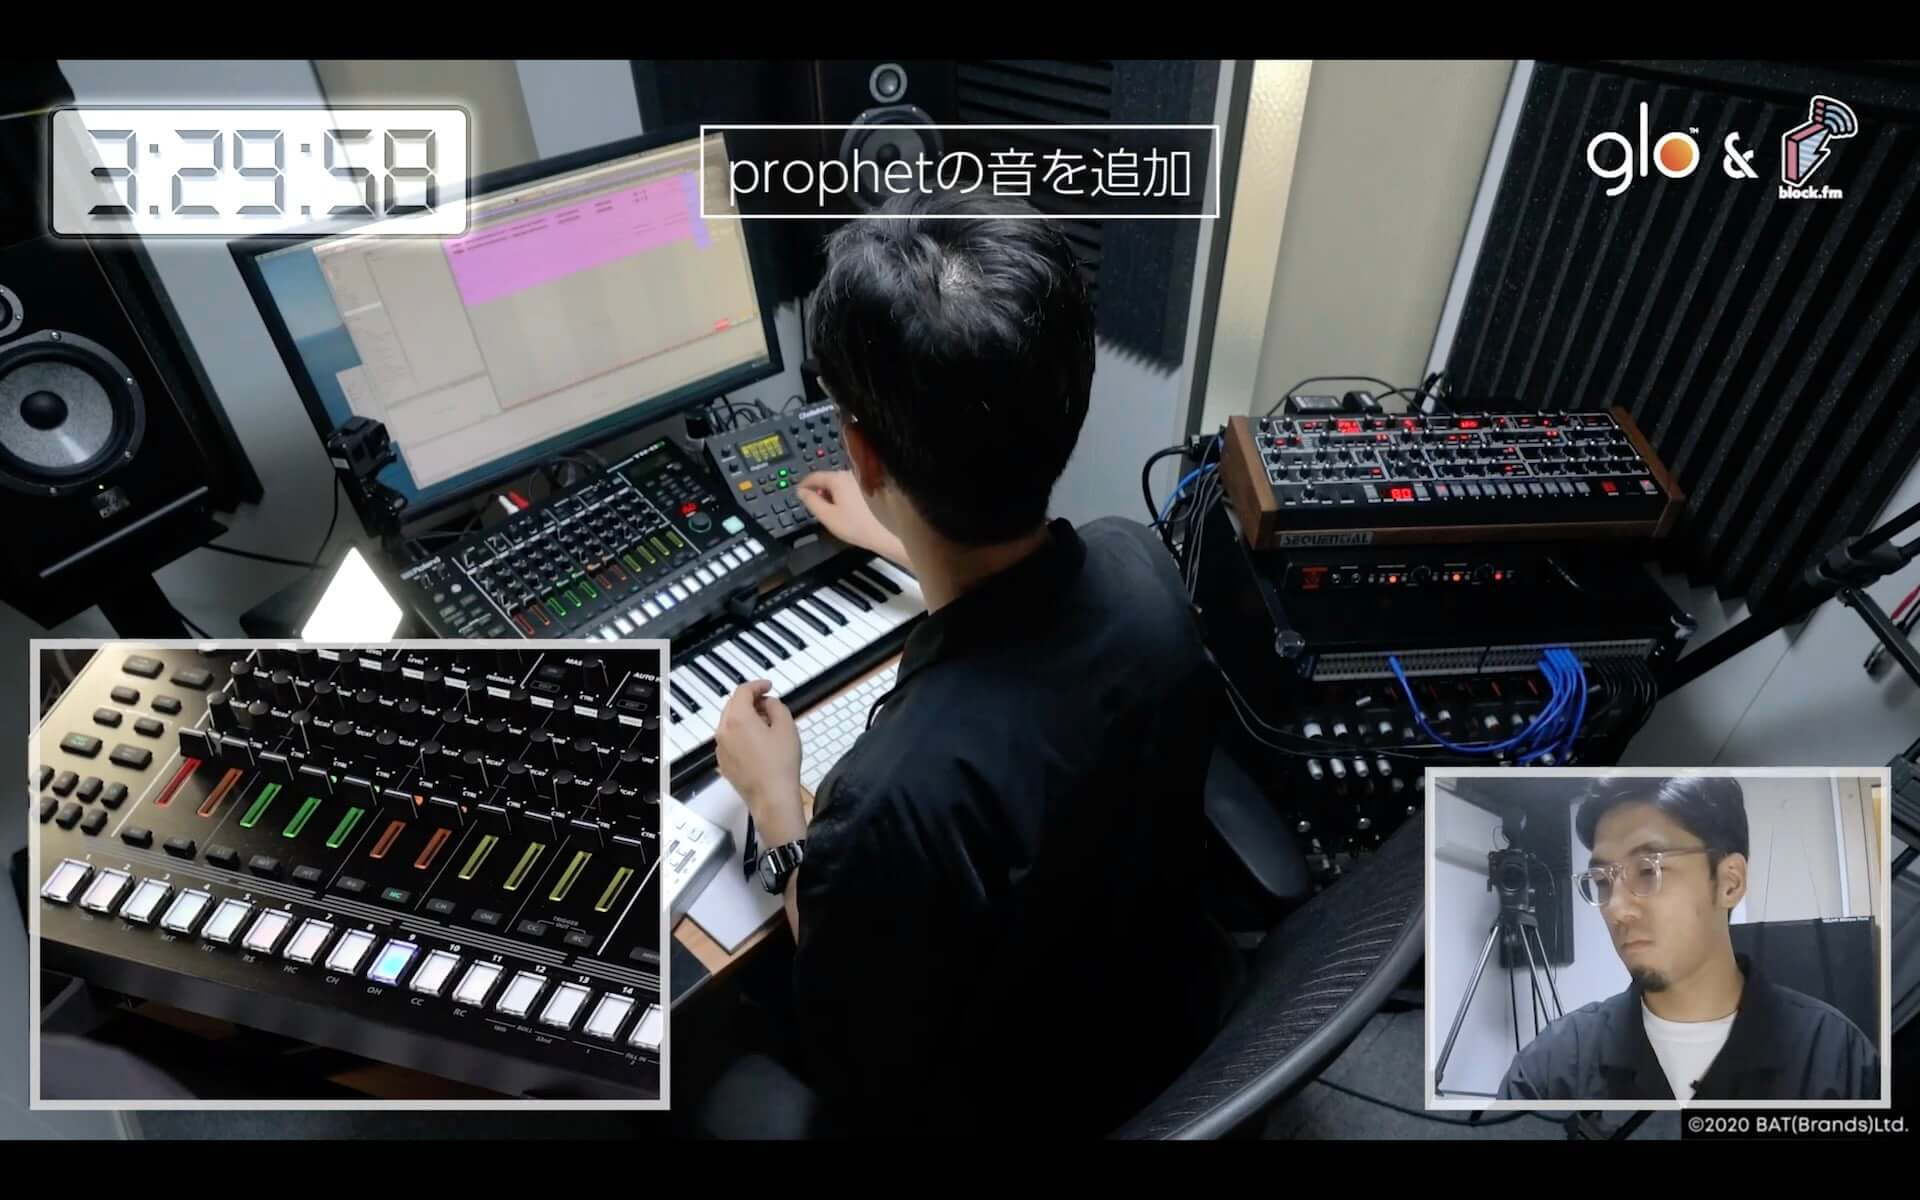 Seiho、tofubeats、Yamato、☆Taku Takahashiが様々なお題に挑戦!glo™とblock.fmが贈る動画シリーズが公開 music200916_glo-blockfm_4-1920x1200